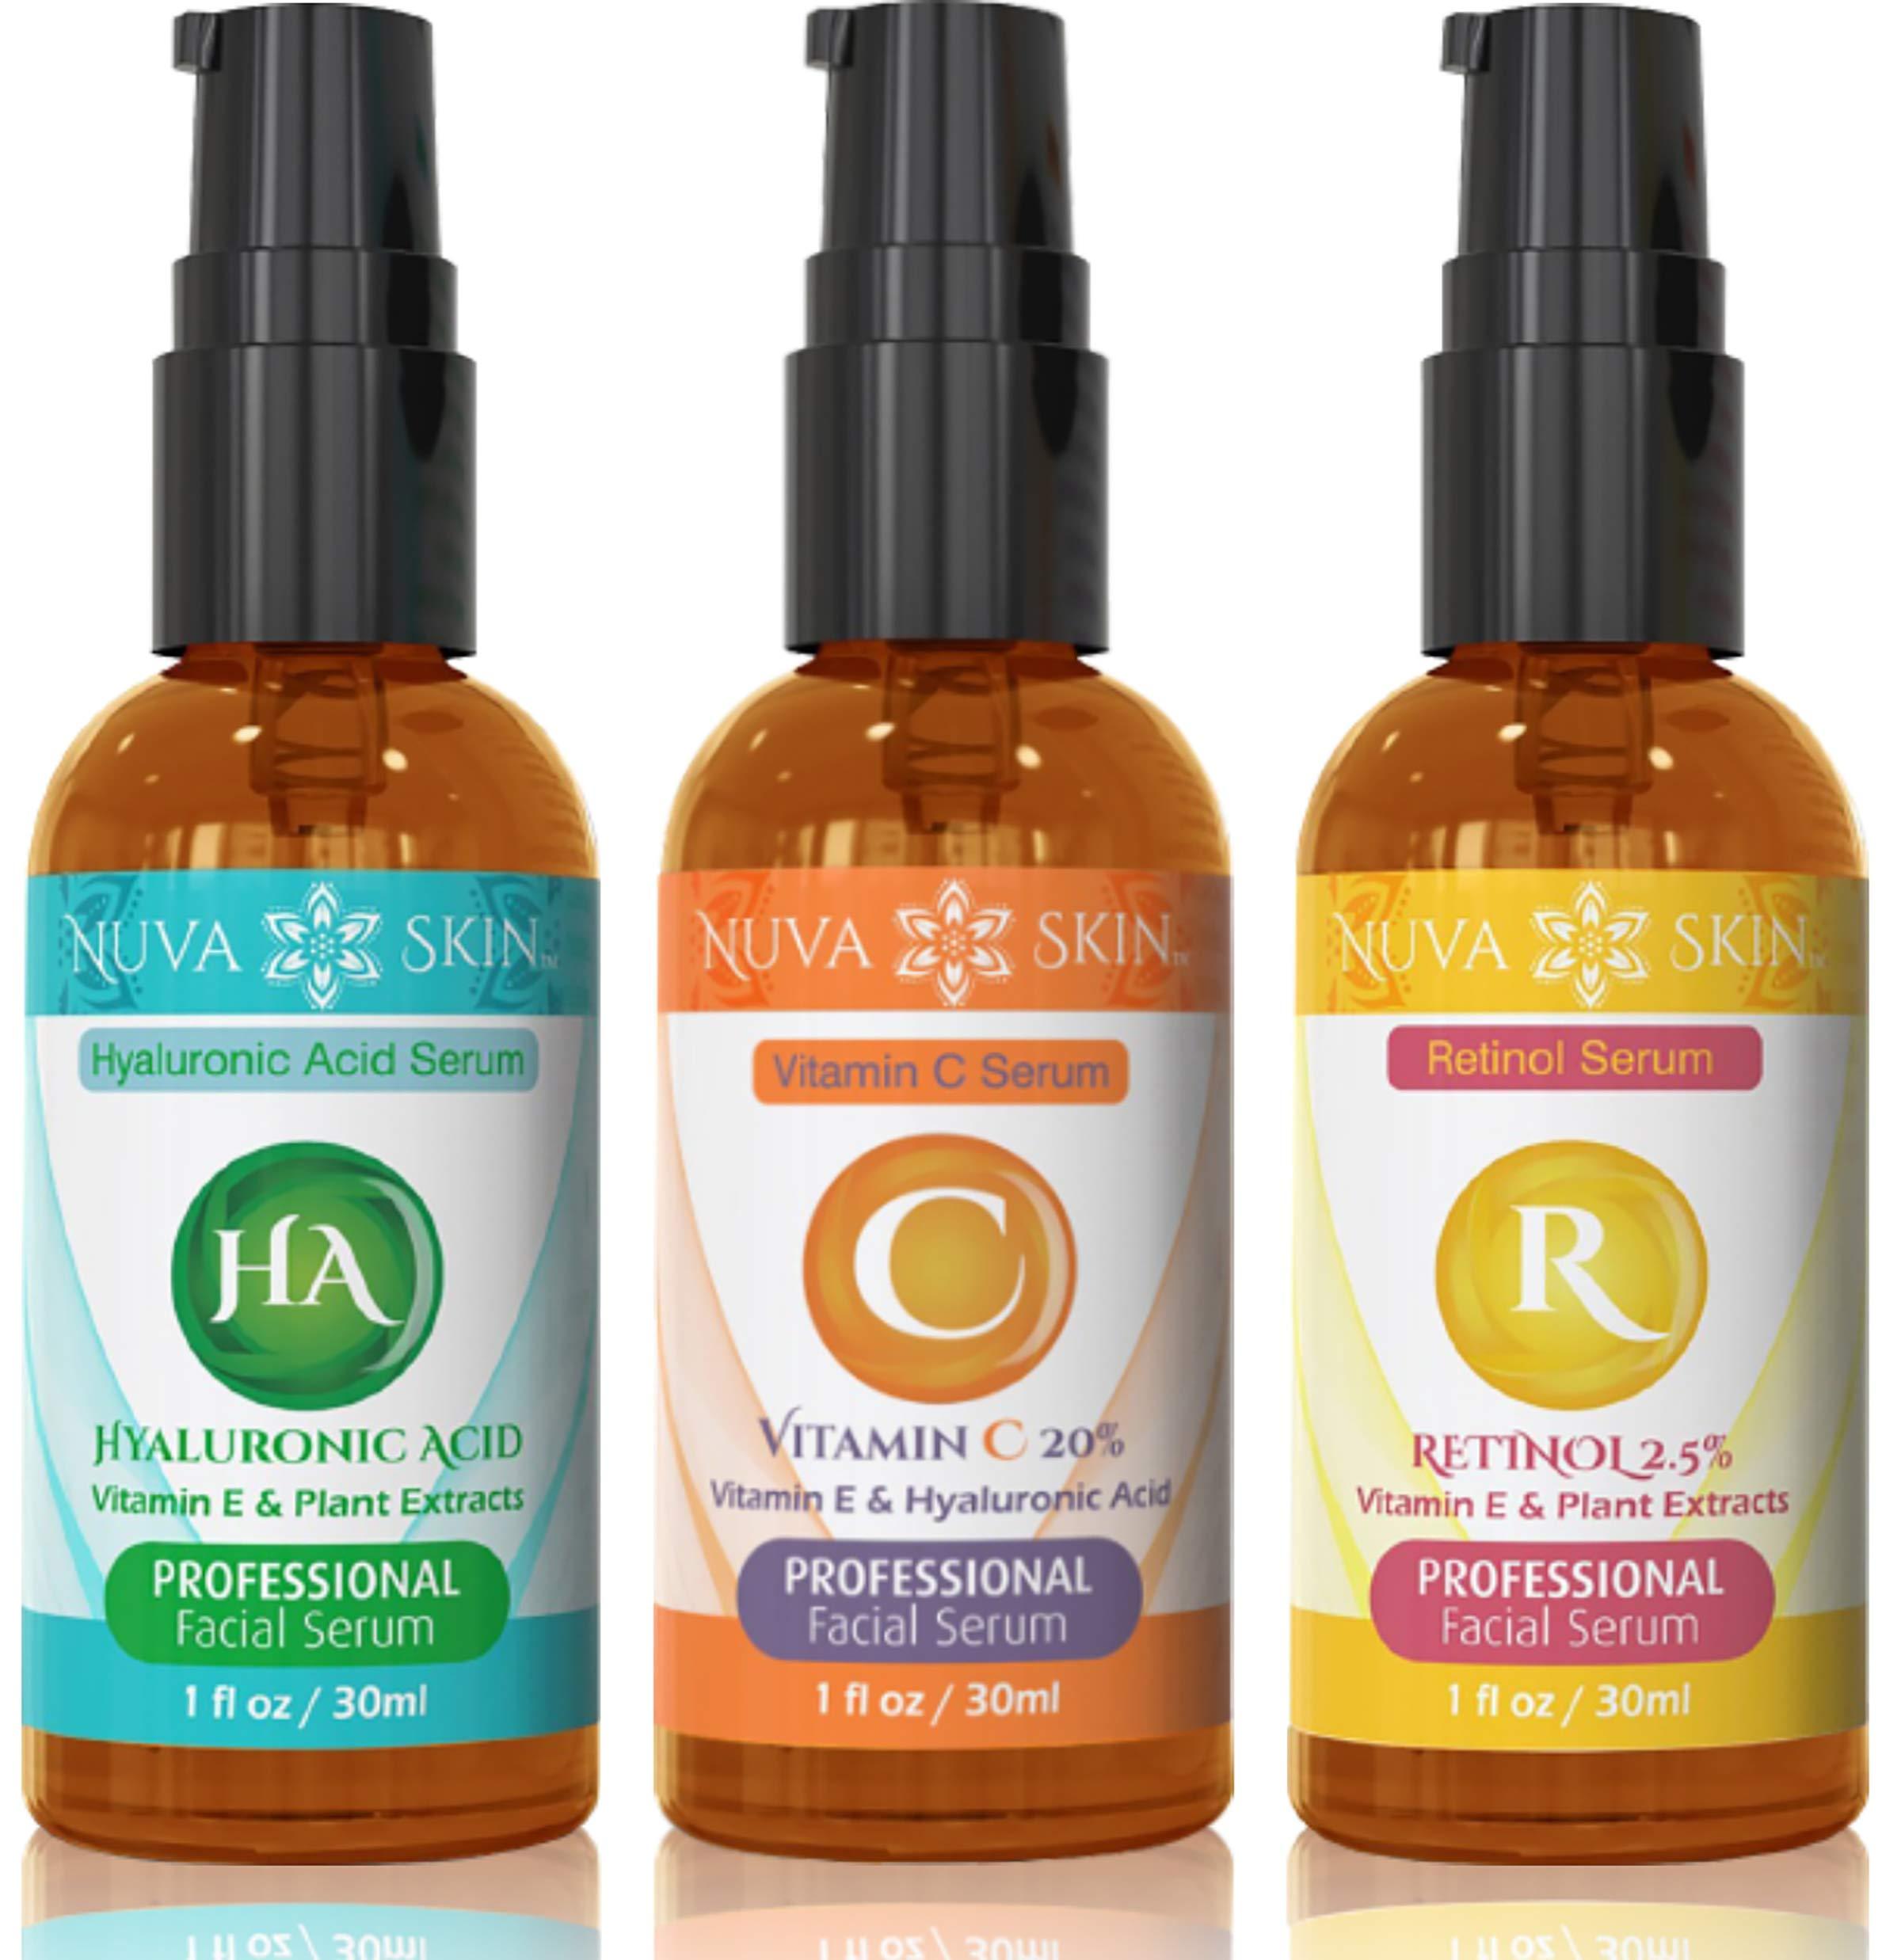 Nuva Skin Facial Serums 3 Pack- Vitamin C Serum, Retinol Serum & Hyaluronic Acid Serum- All-Natural Face Serum by Nuva Skin